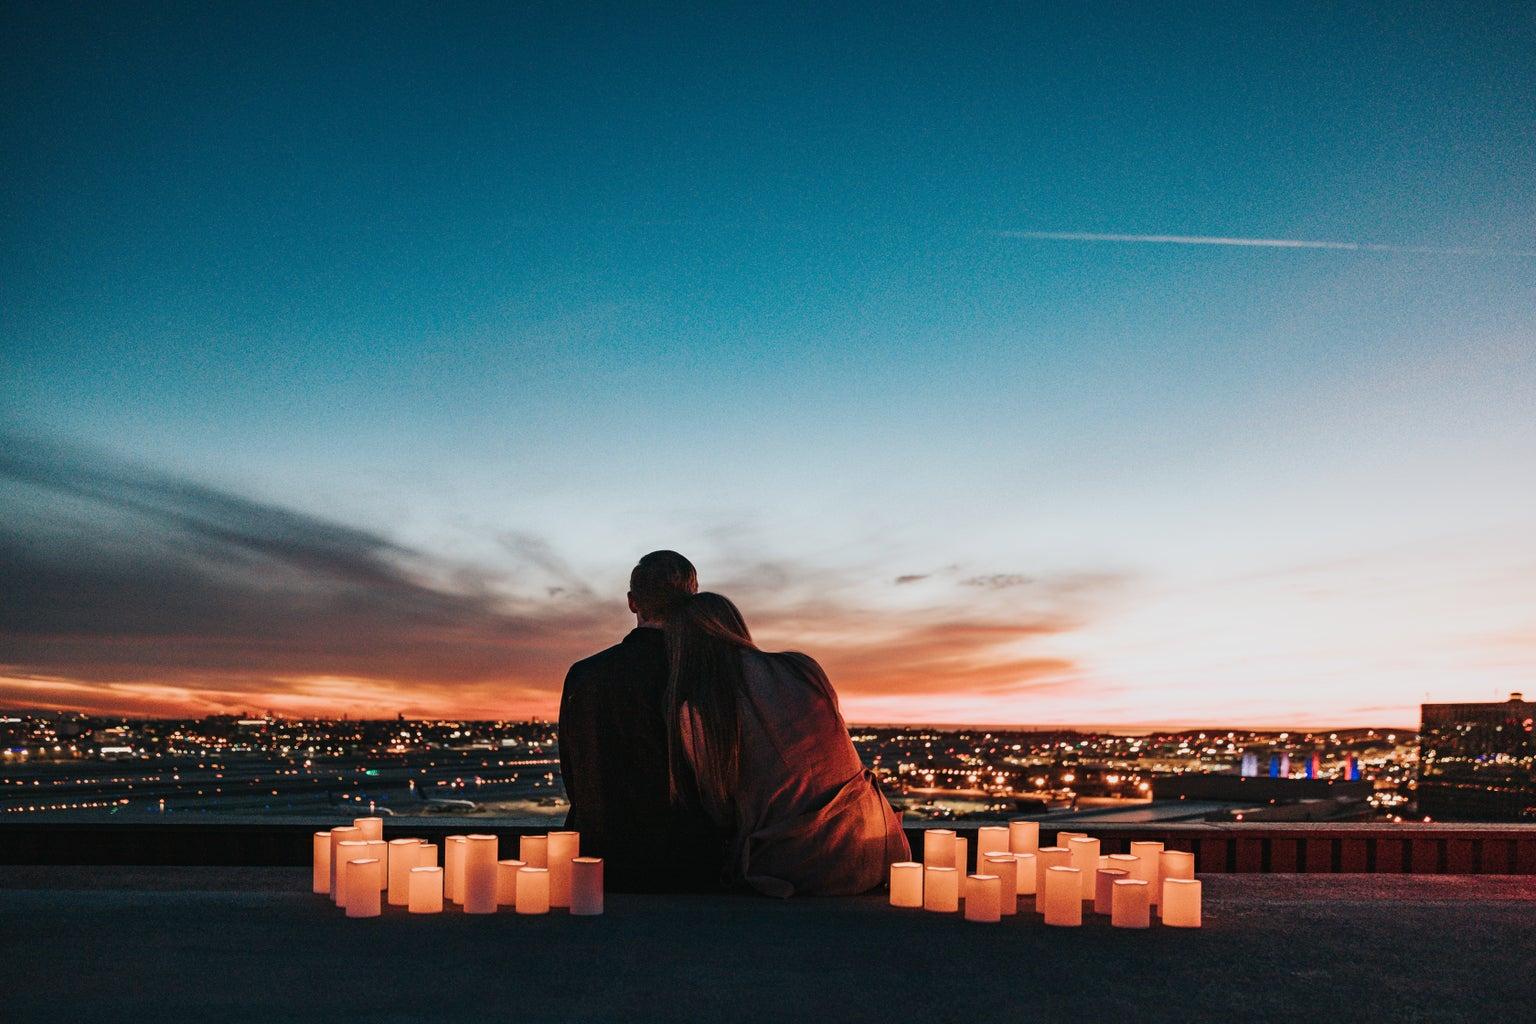 Couple sitting next to lights watching sunset